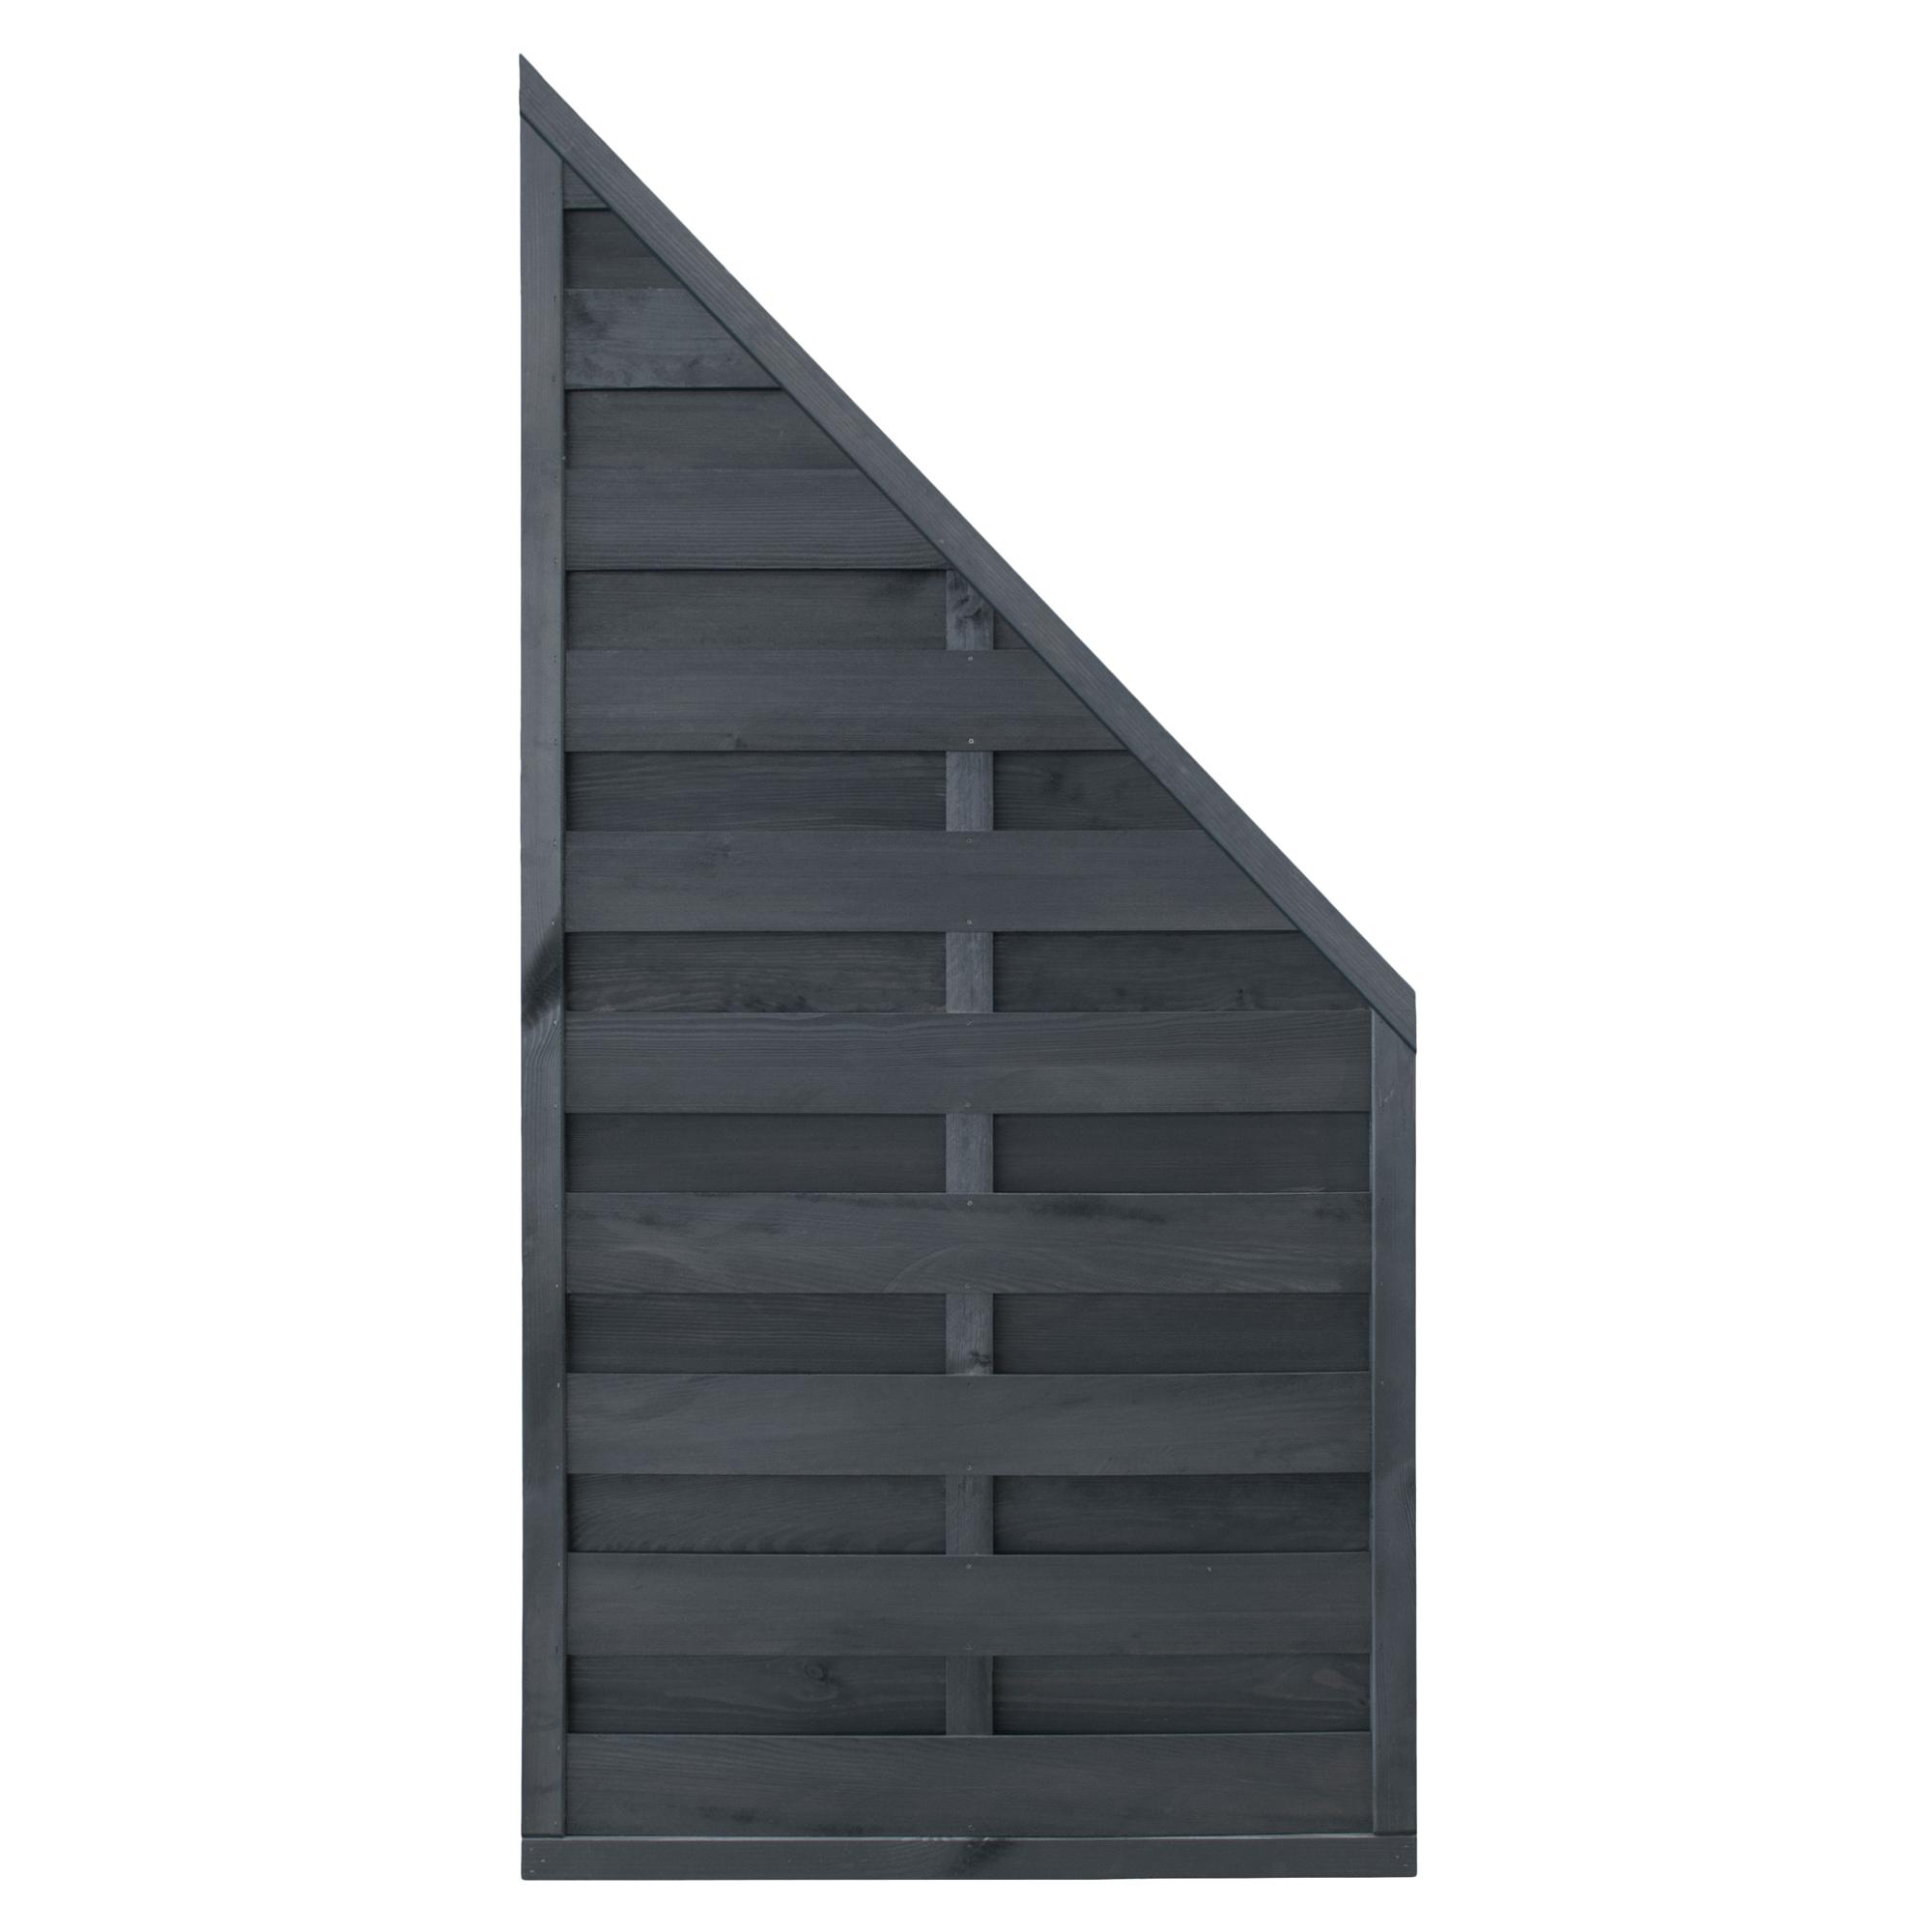 Dichtzaun Schrag 180 X 90 Cm Grau ǀ Toom Baumarkt